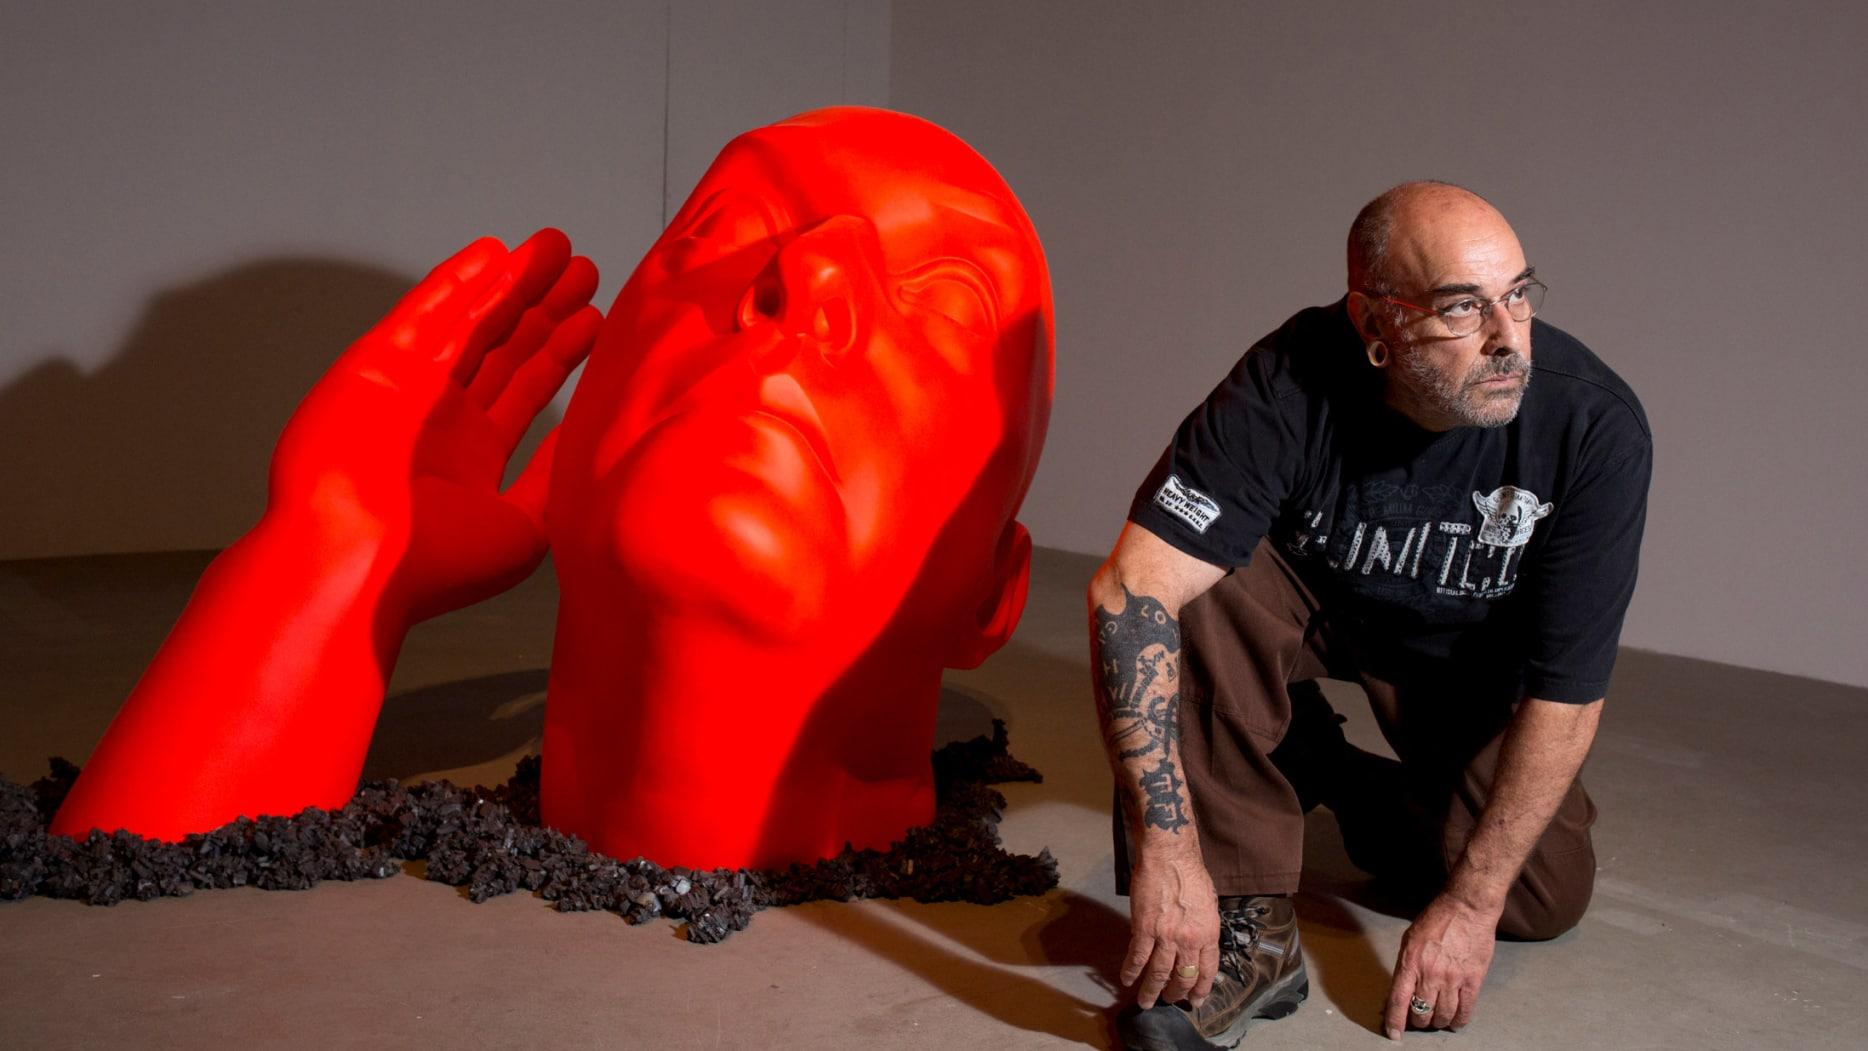 Uri Katzenstein, untitled, 2013-2015 Backyard exhibition at the Tel Aviv Museum of art